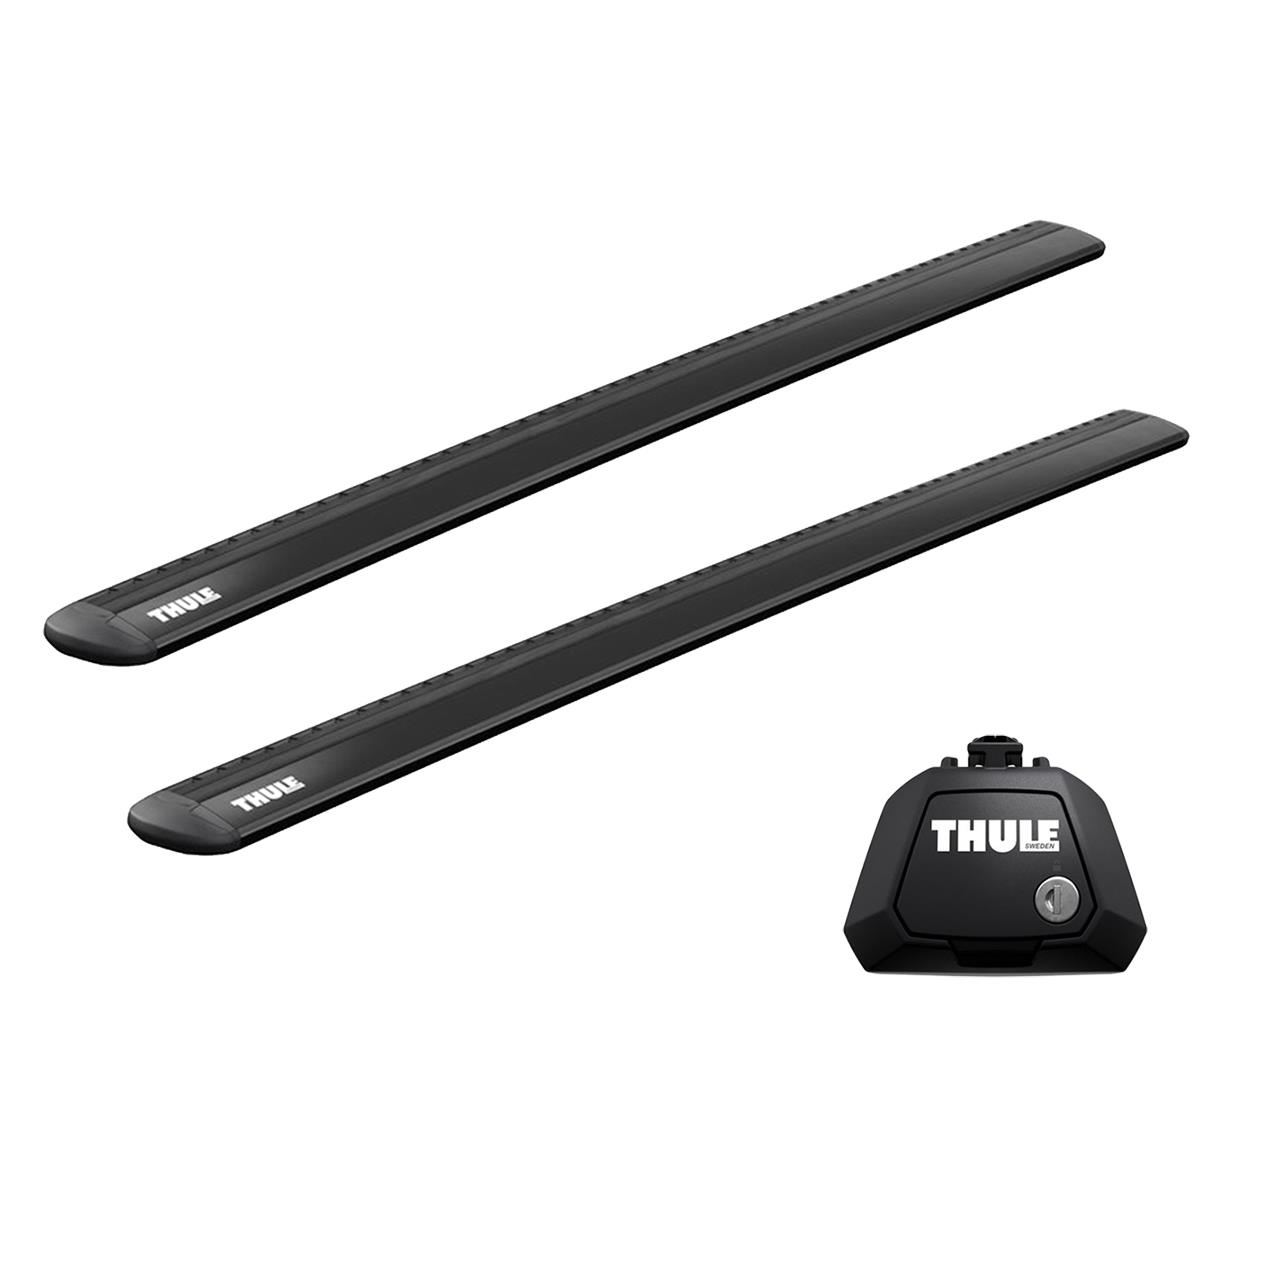 Напречни греди Thule Evo Raised Rail WingBar Evo 127cm в Черно за MITSUBISHI Pajero Sport 5 врати SUV 06-08 (S